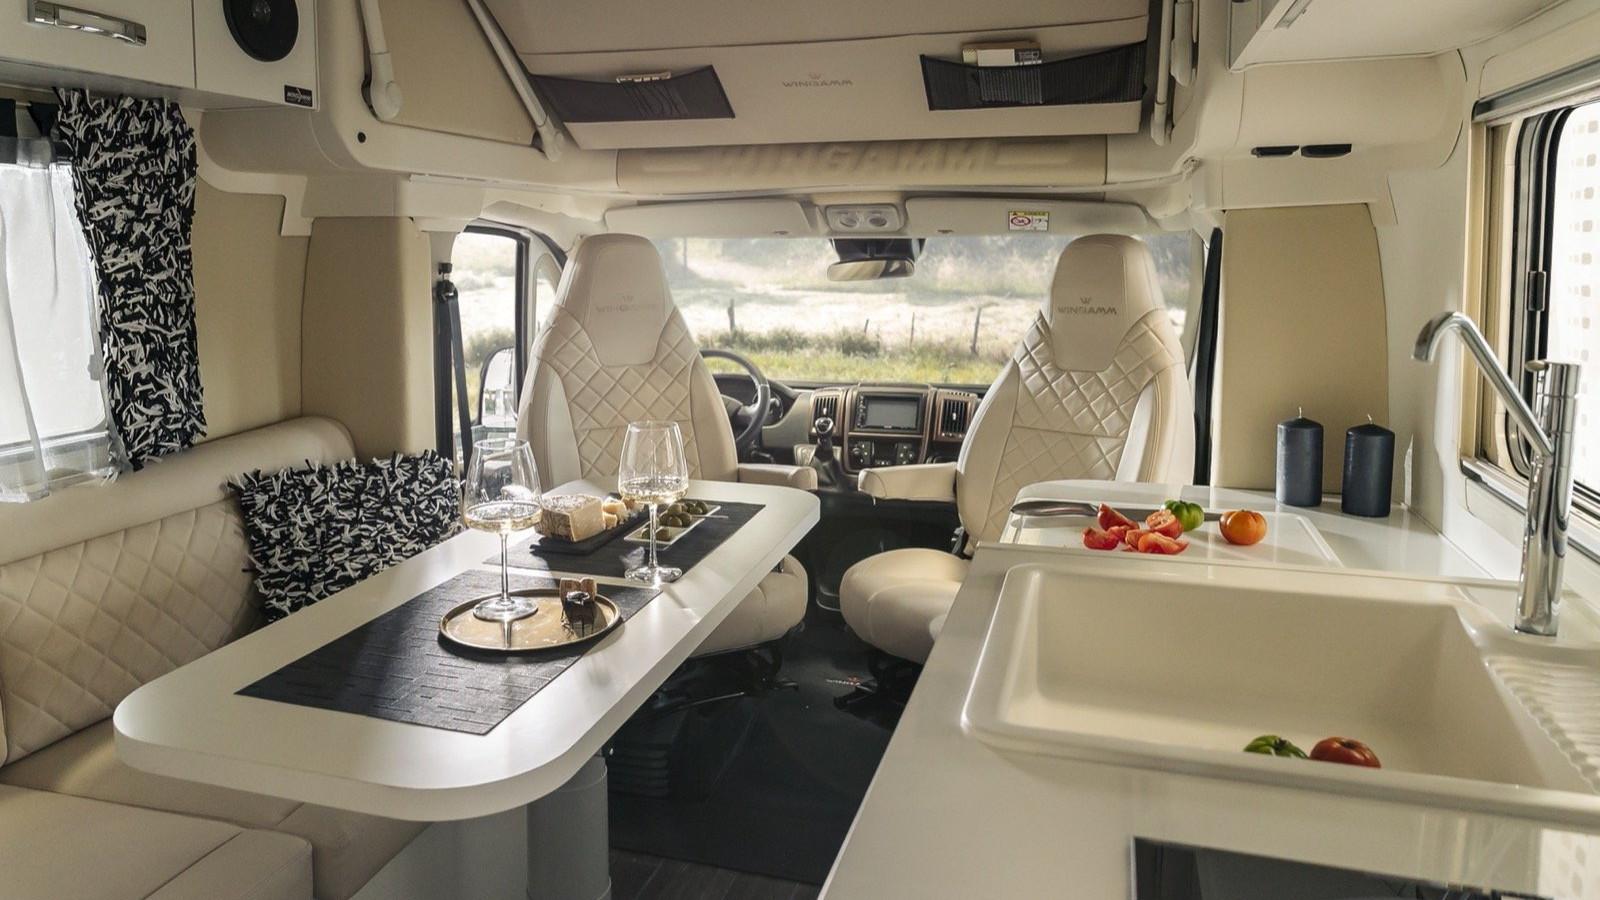 Oasi 540 - Intérieur design de luxe pour camping-car compact - camping-car